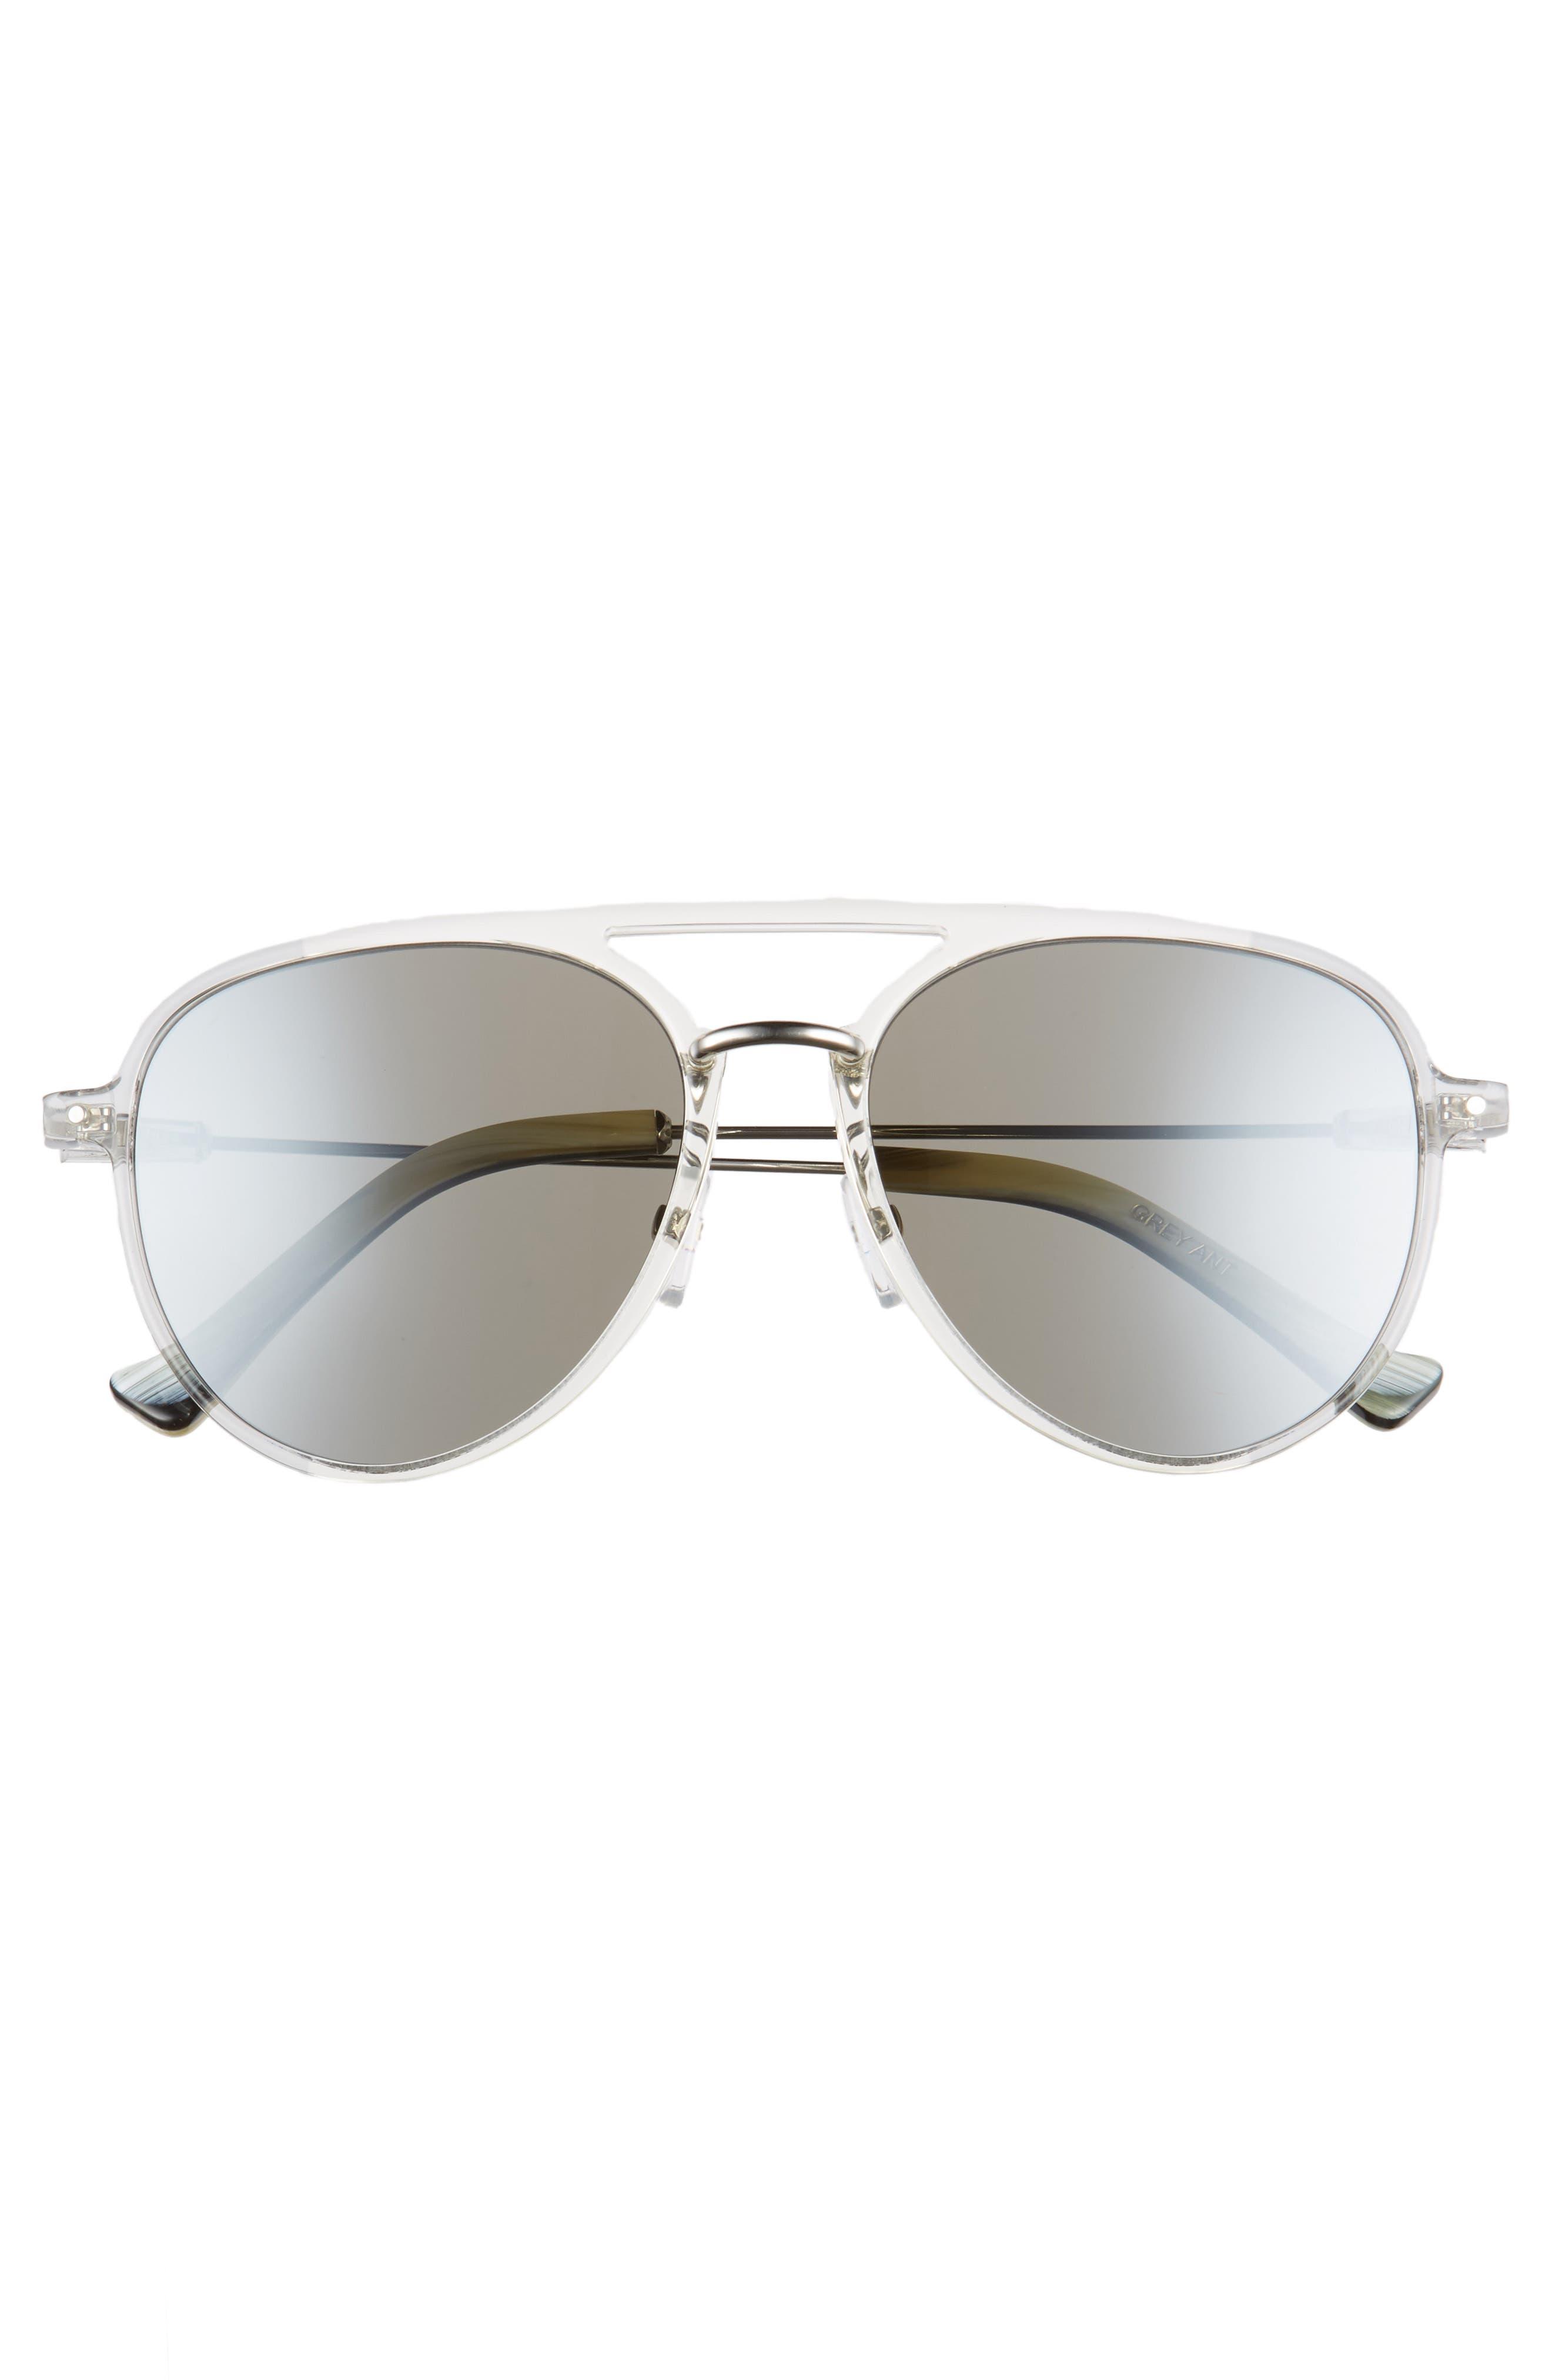 Praph 57mm Sunglasses,                             Alternate thumbnail 3, color,                             SILVER LENS/ CLEAR HARDWARE